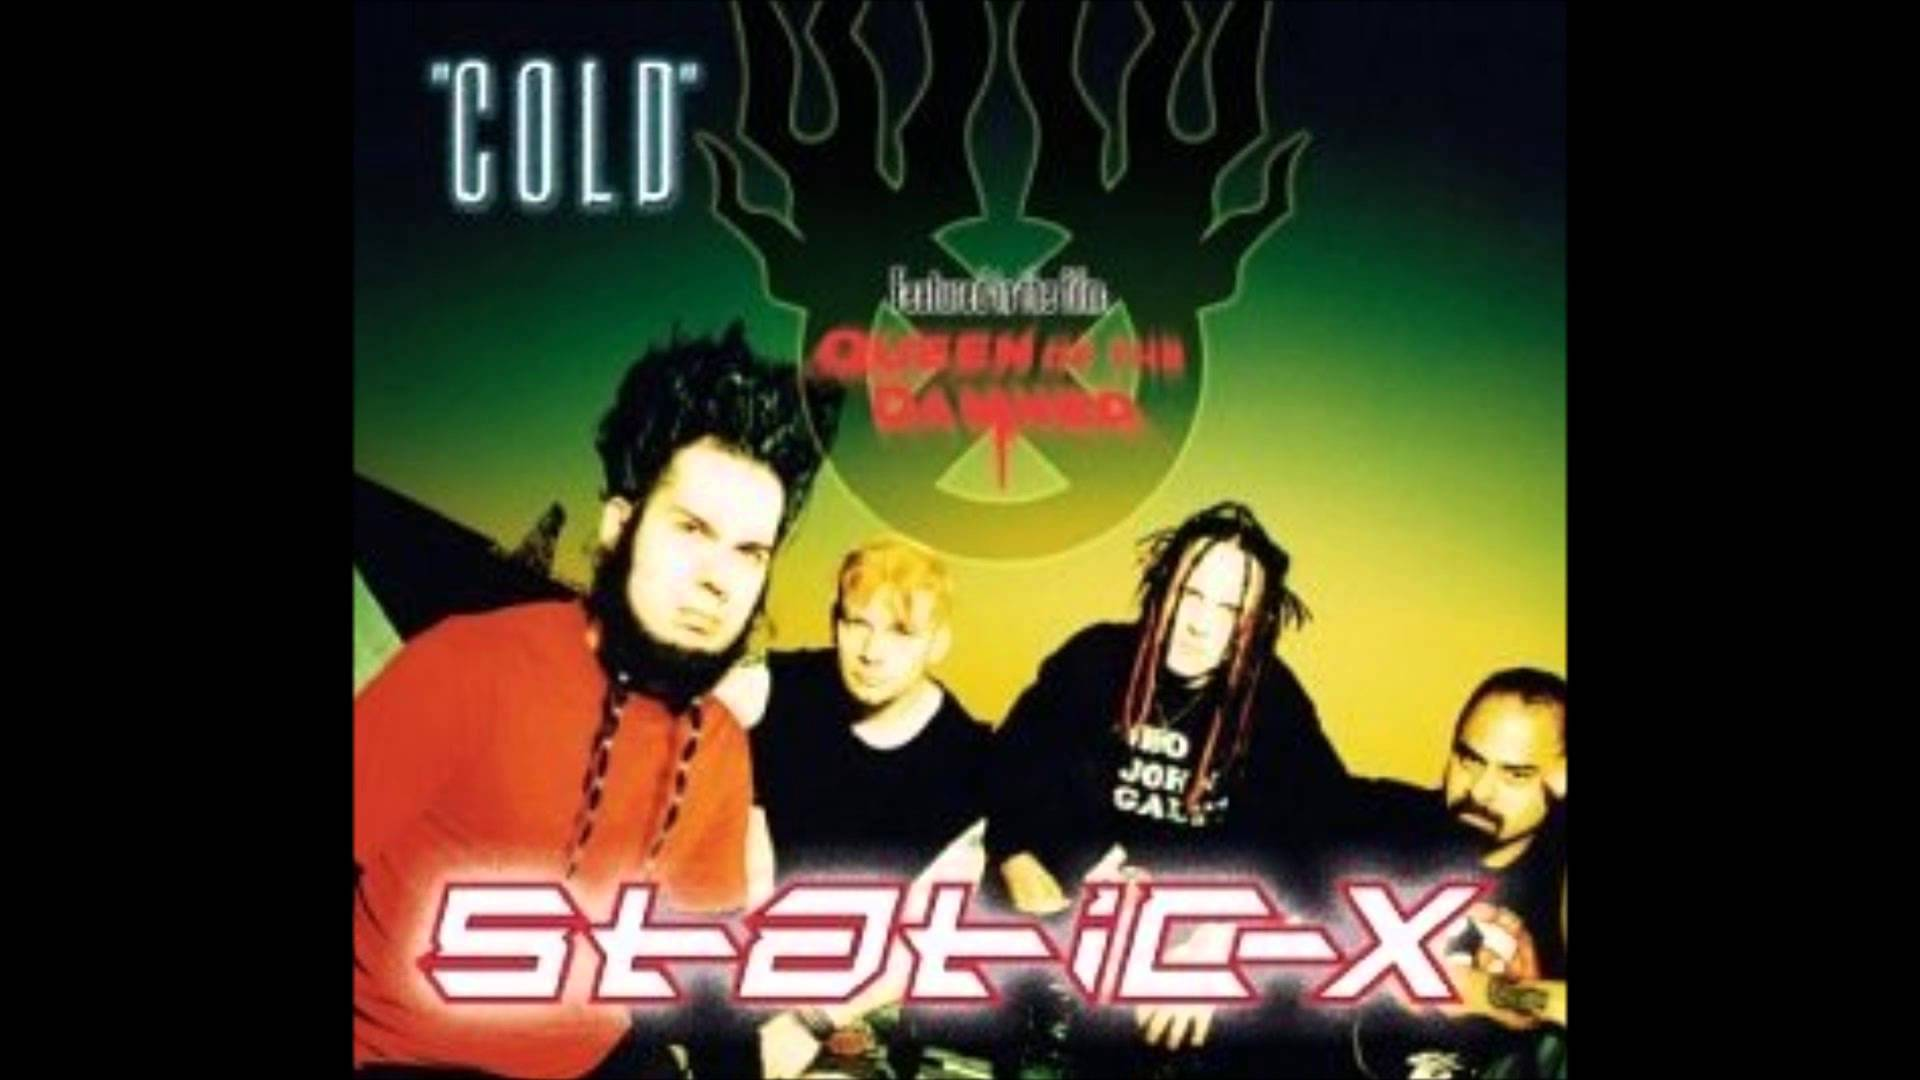 Static X Cold Video 2002 Imdb